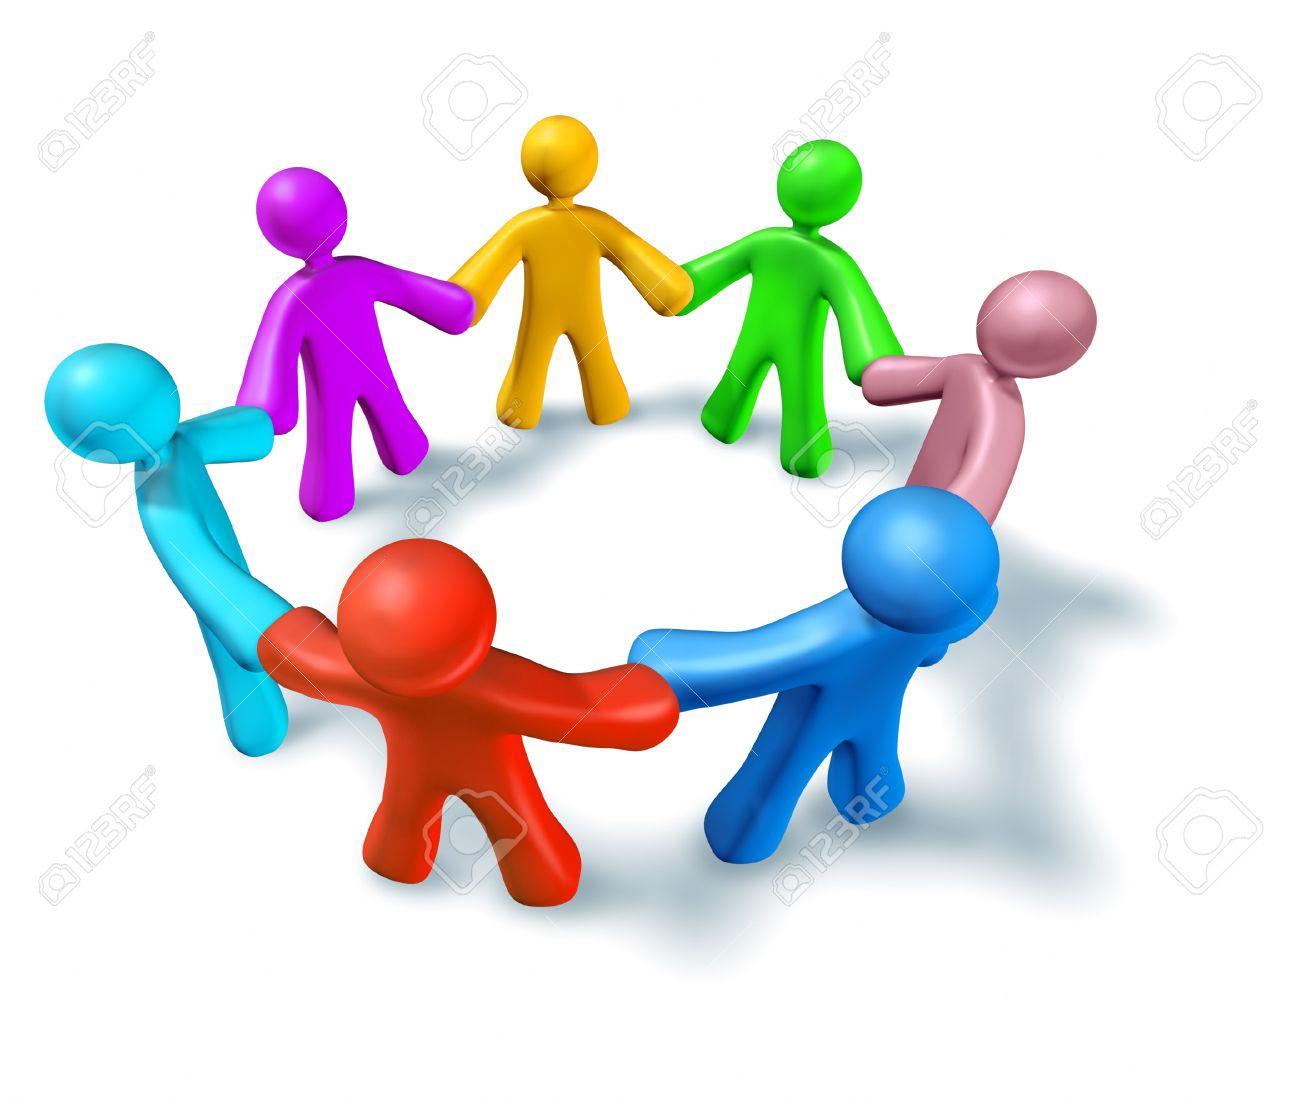 Rainbow coalition symbol representing teamwork and partnership rainbow coalition symbol representing teamwork and partnership stock photo 11155852 biocorpaavc